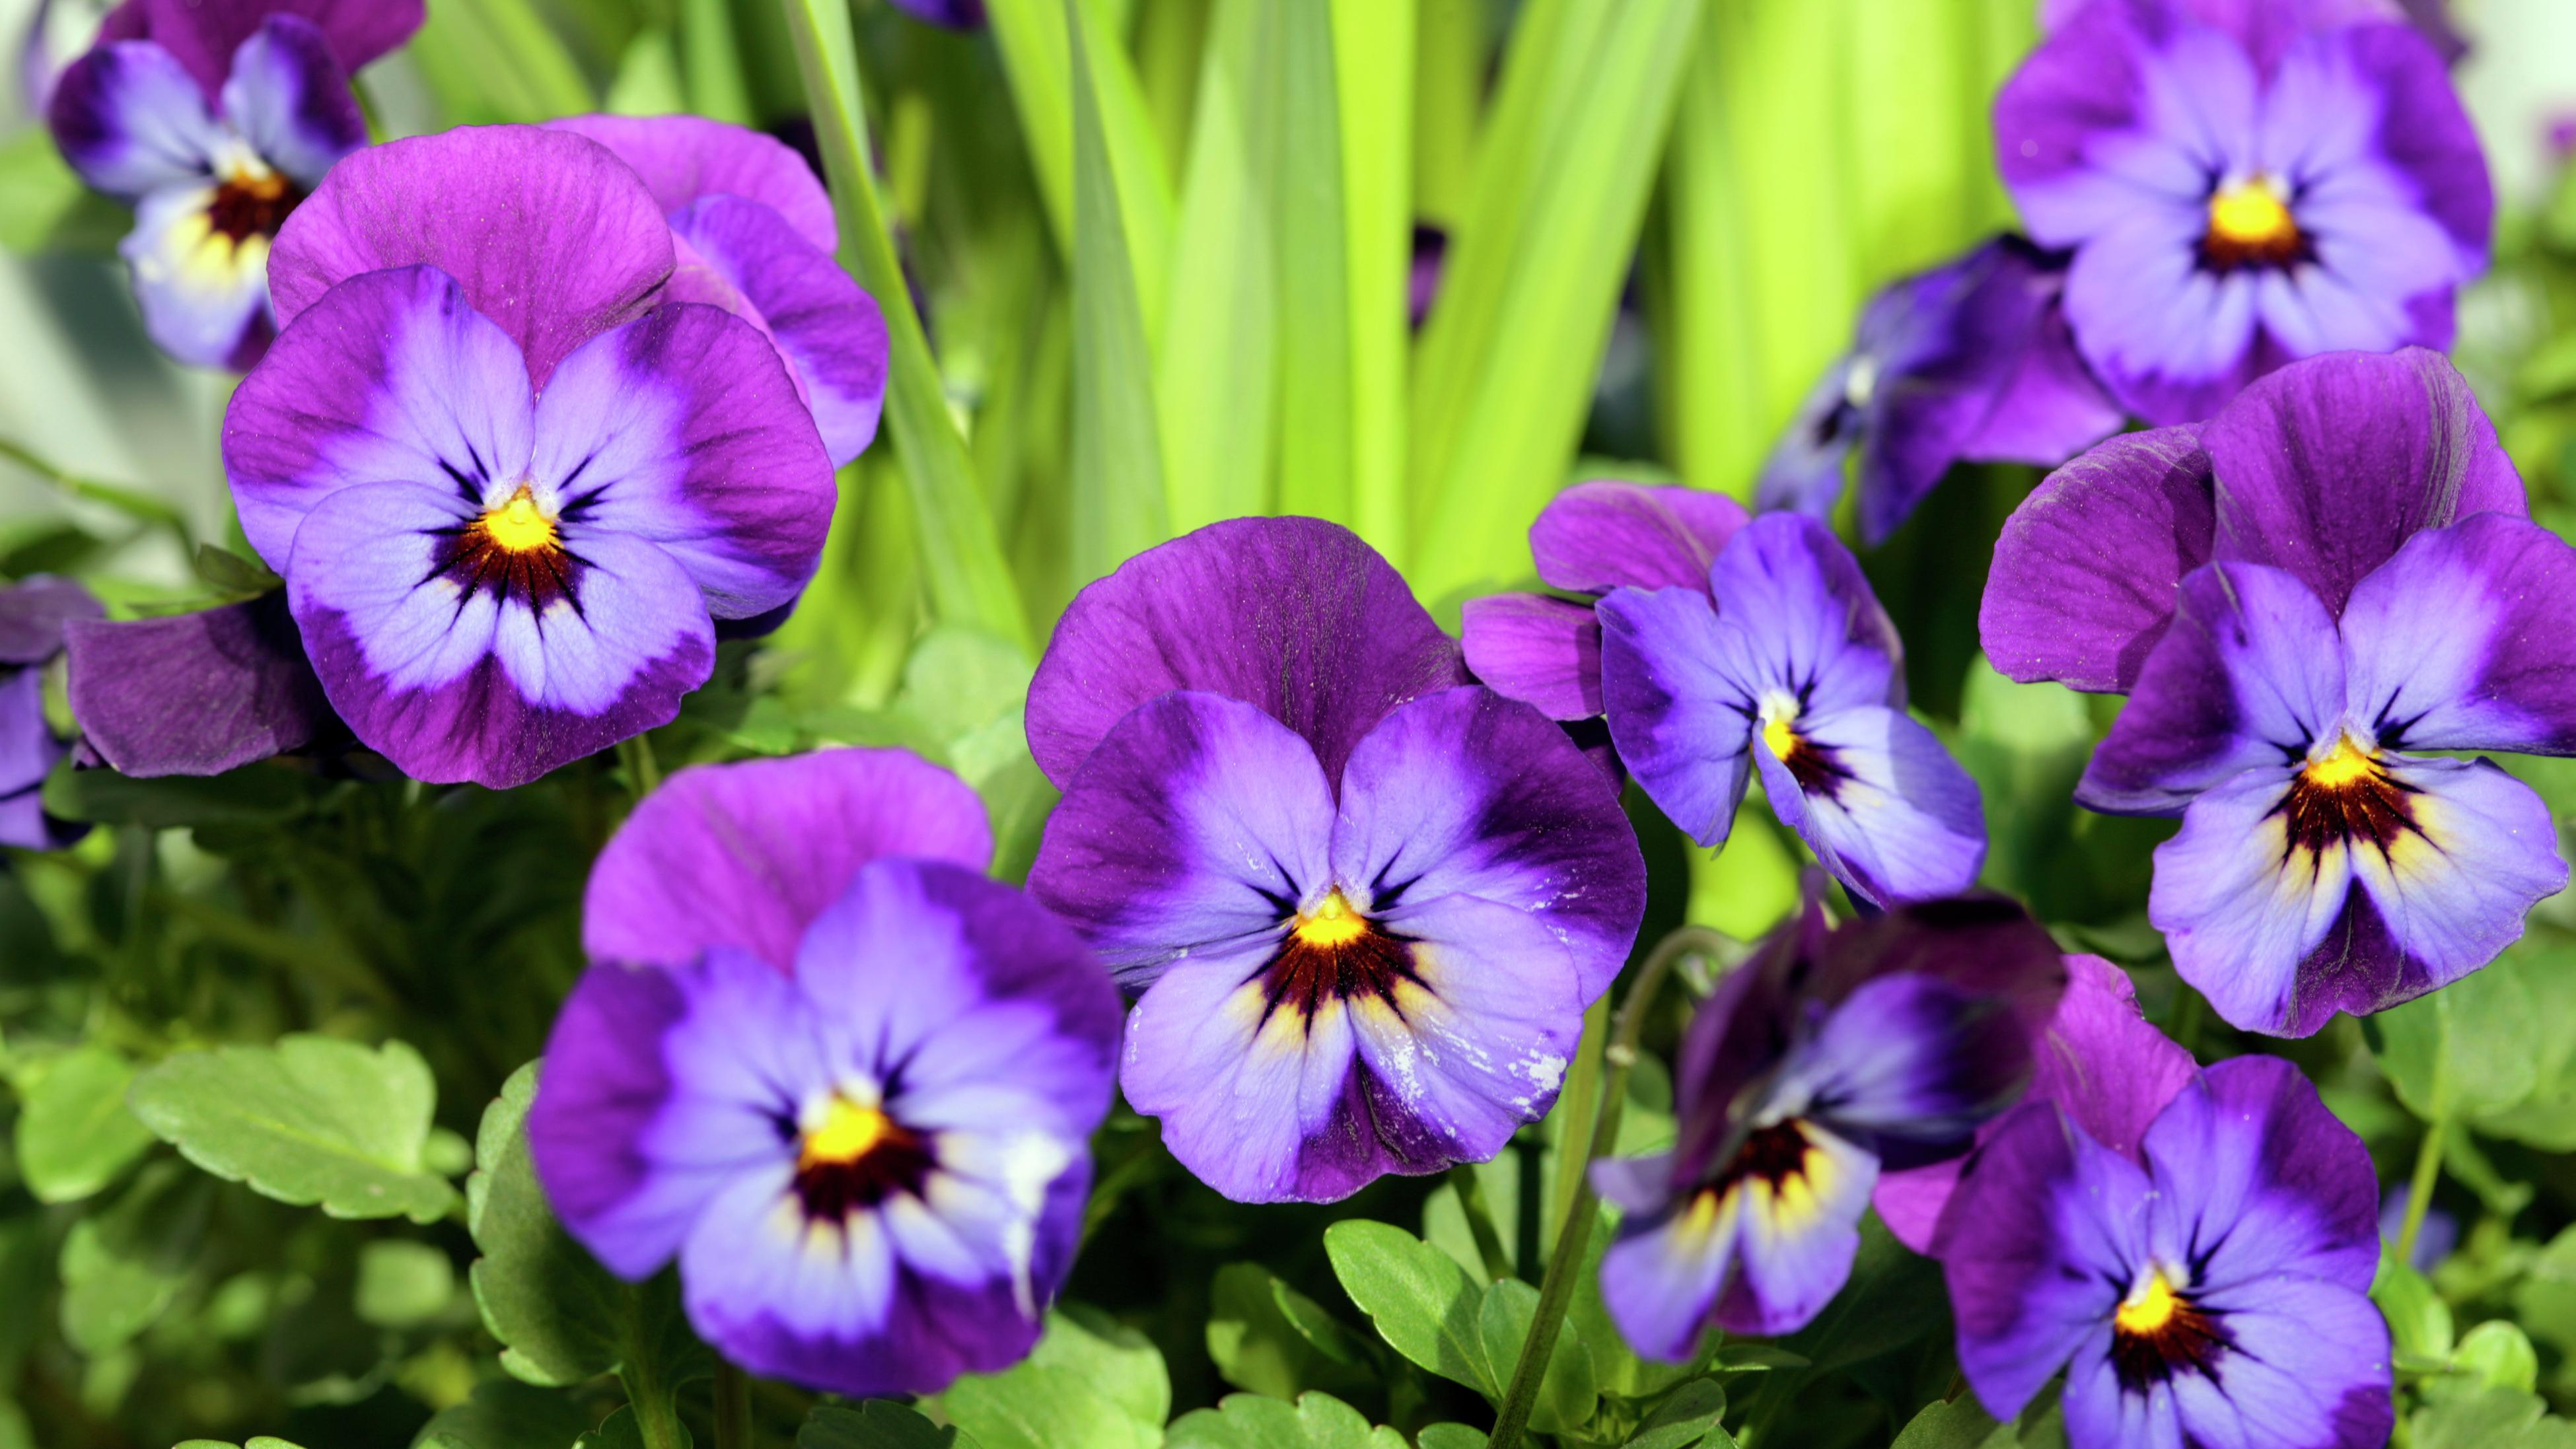 Close up of a purple violet flower.